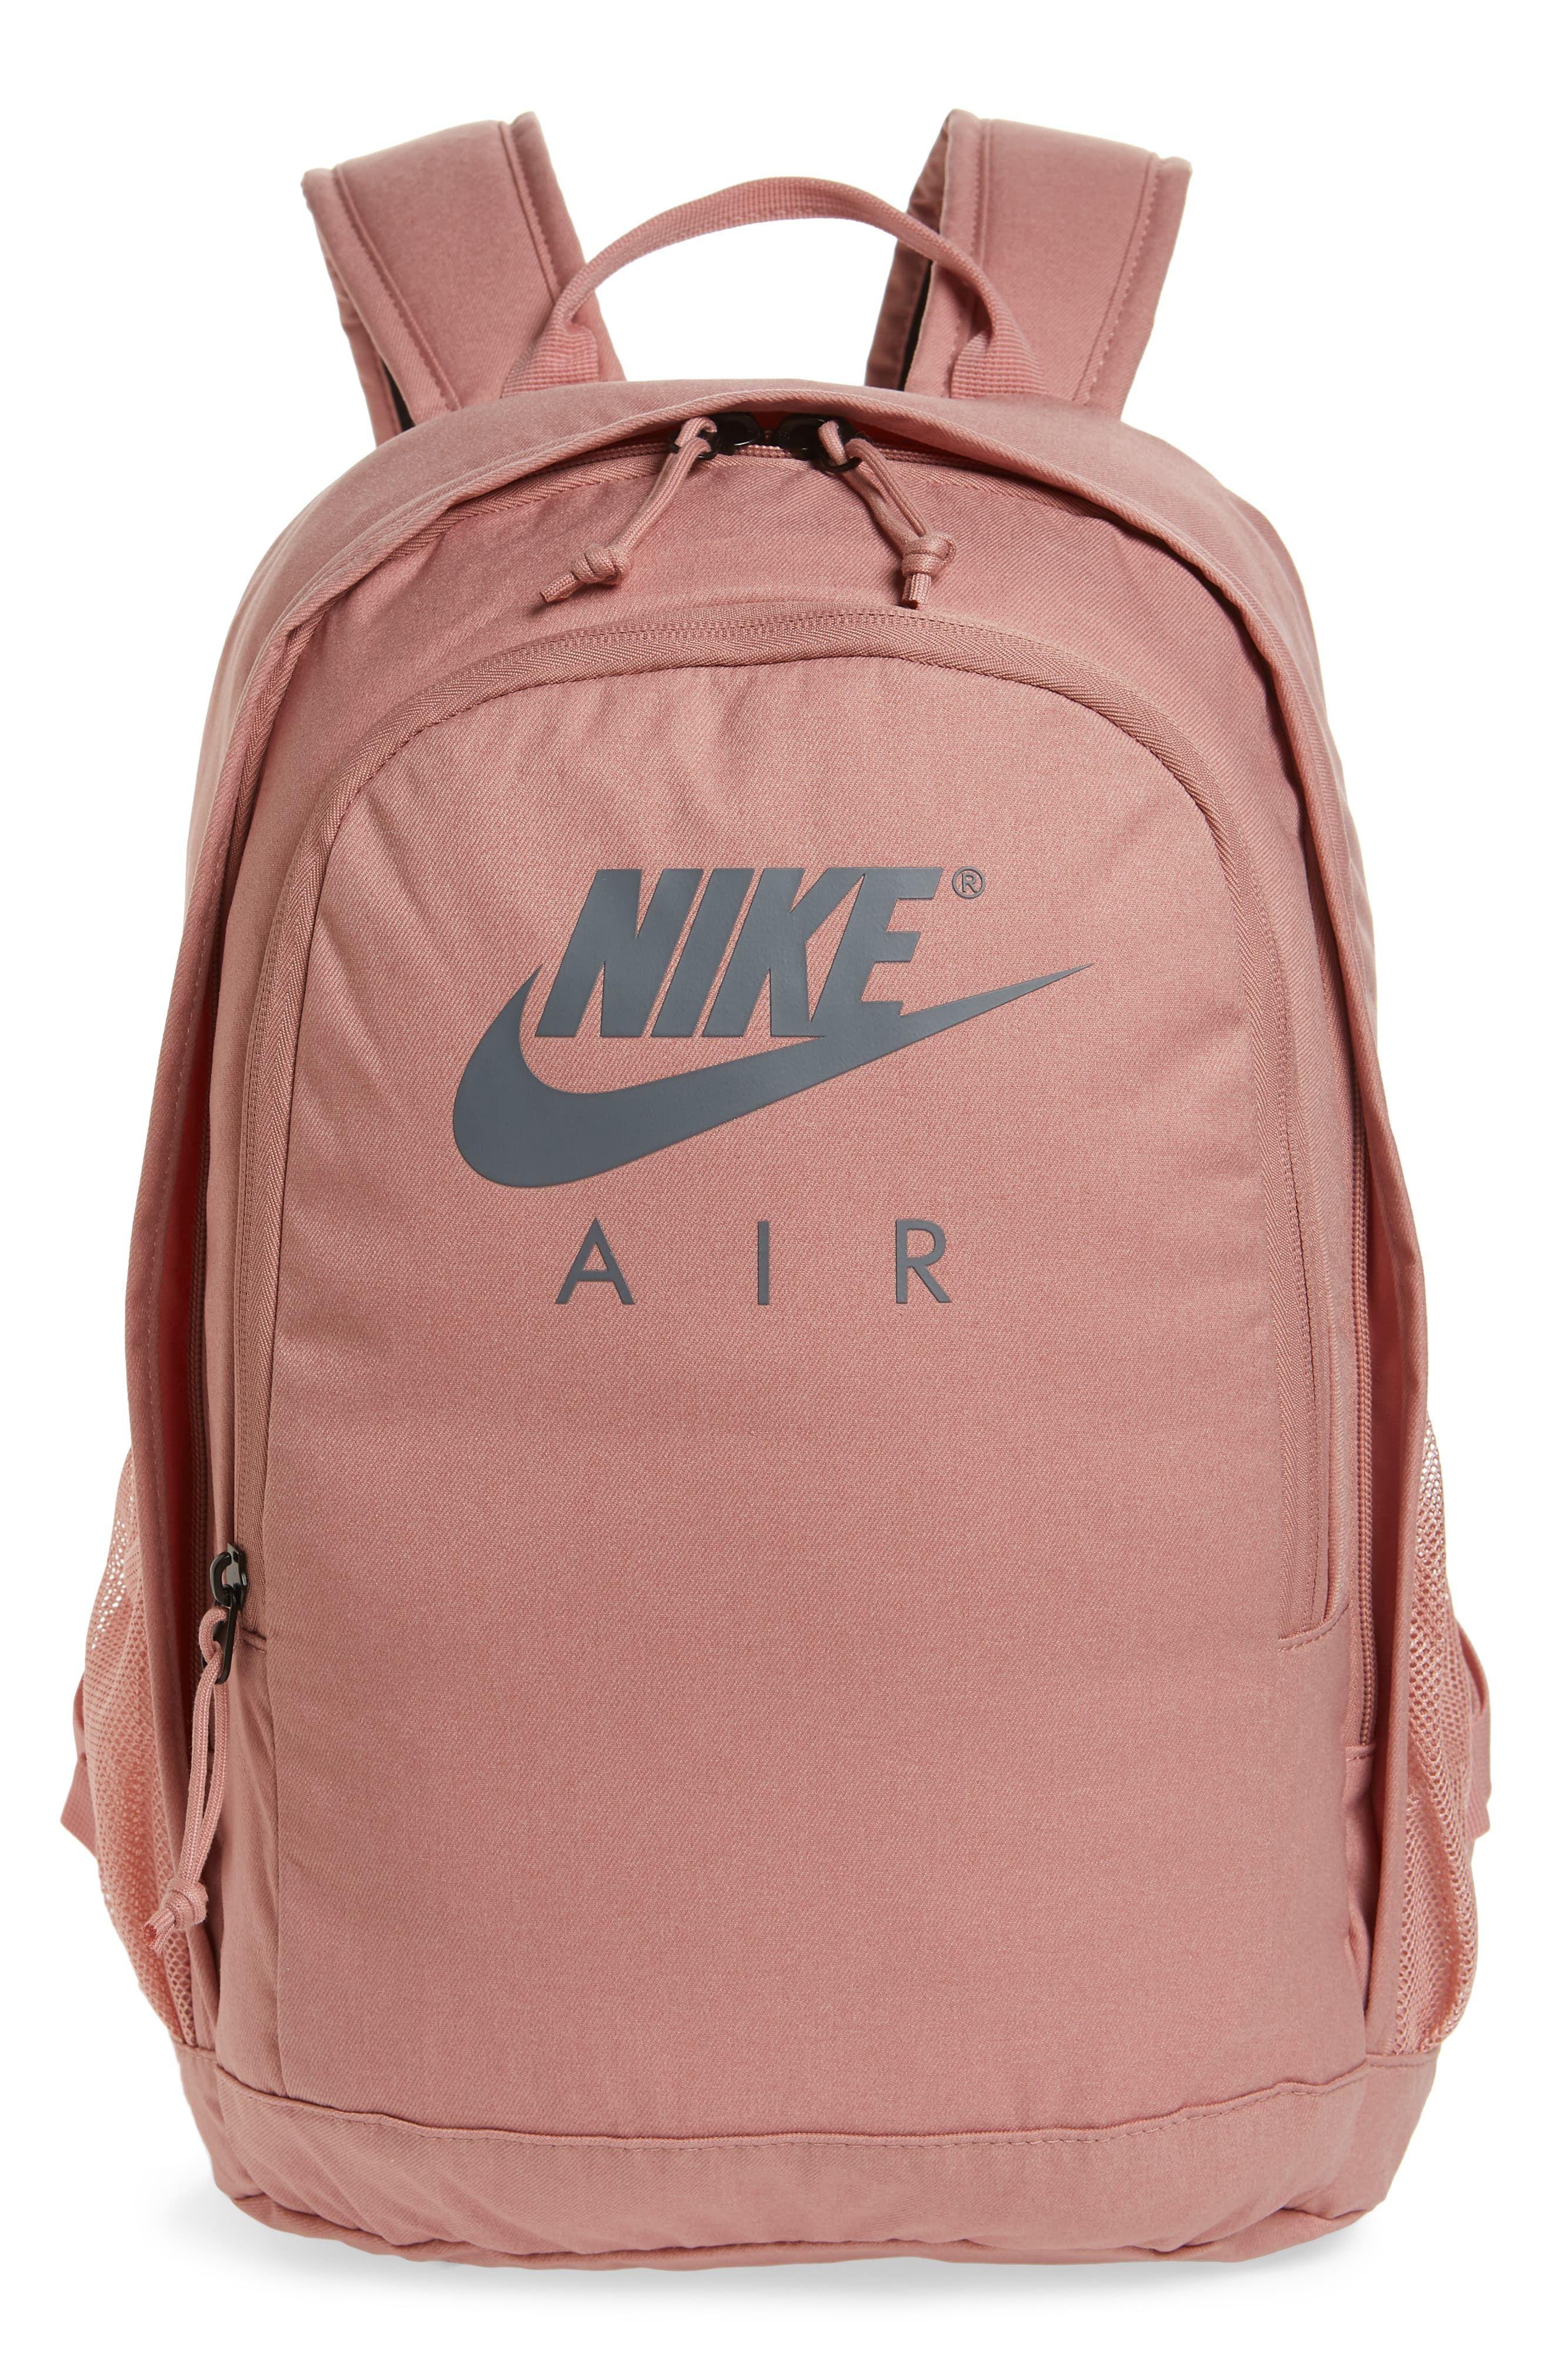 Nike Hayward Rucksack Laptop Backpack Sport Tasche